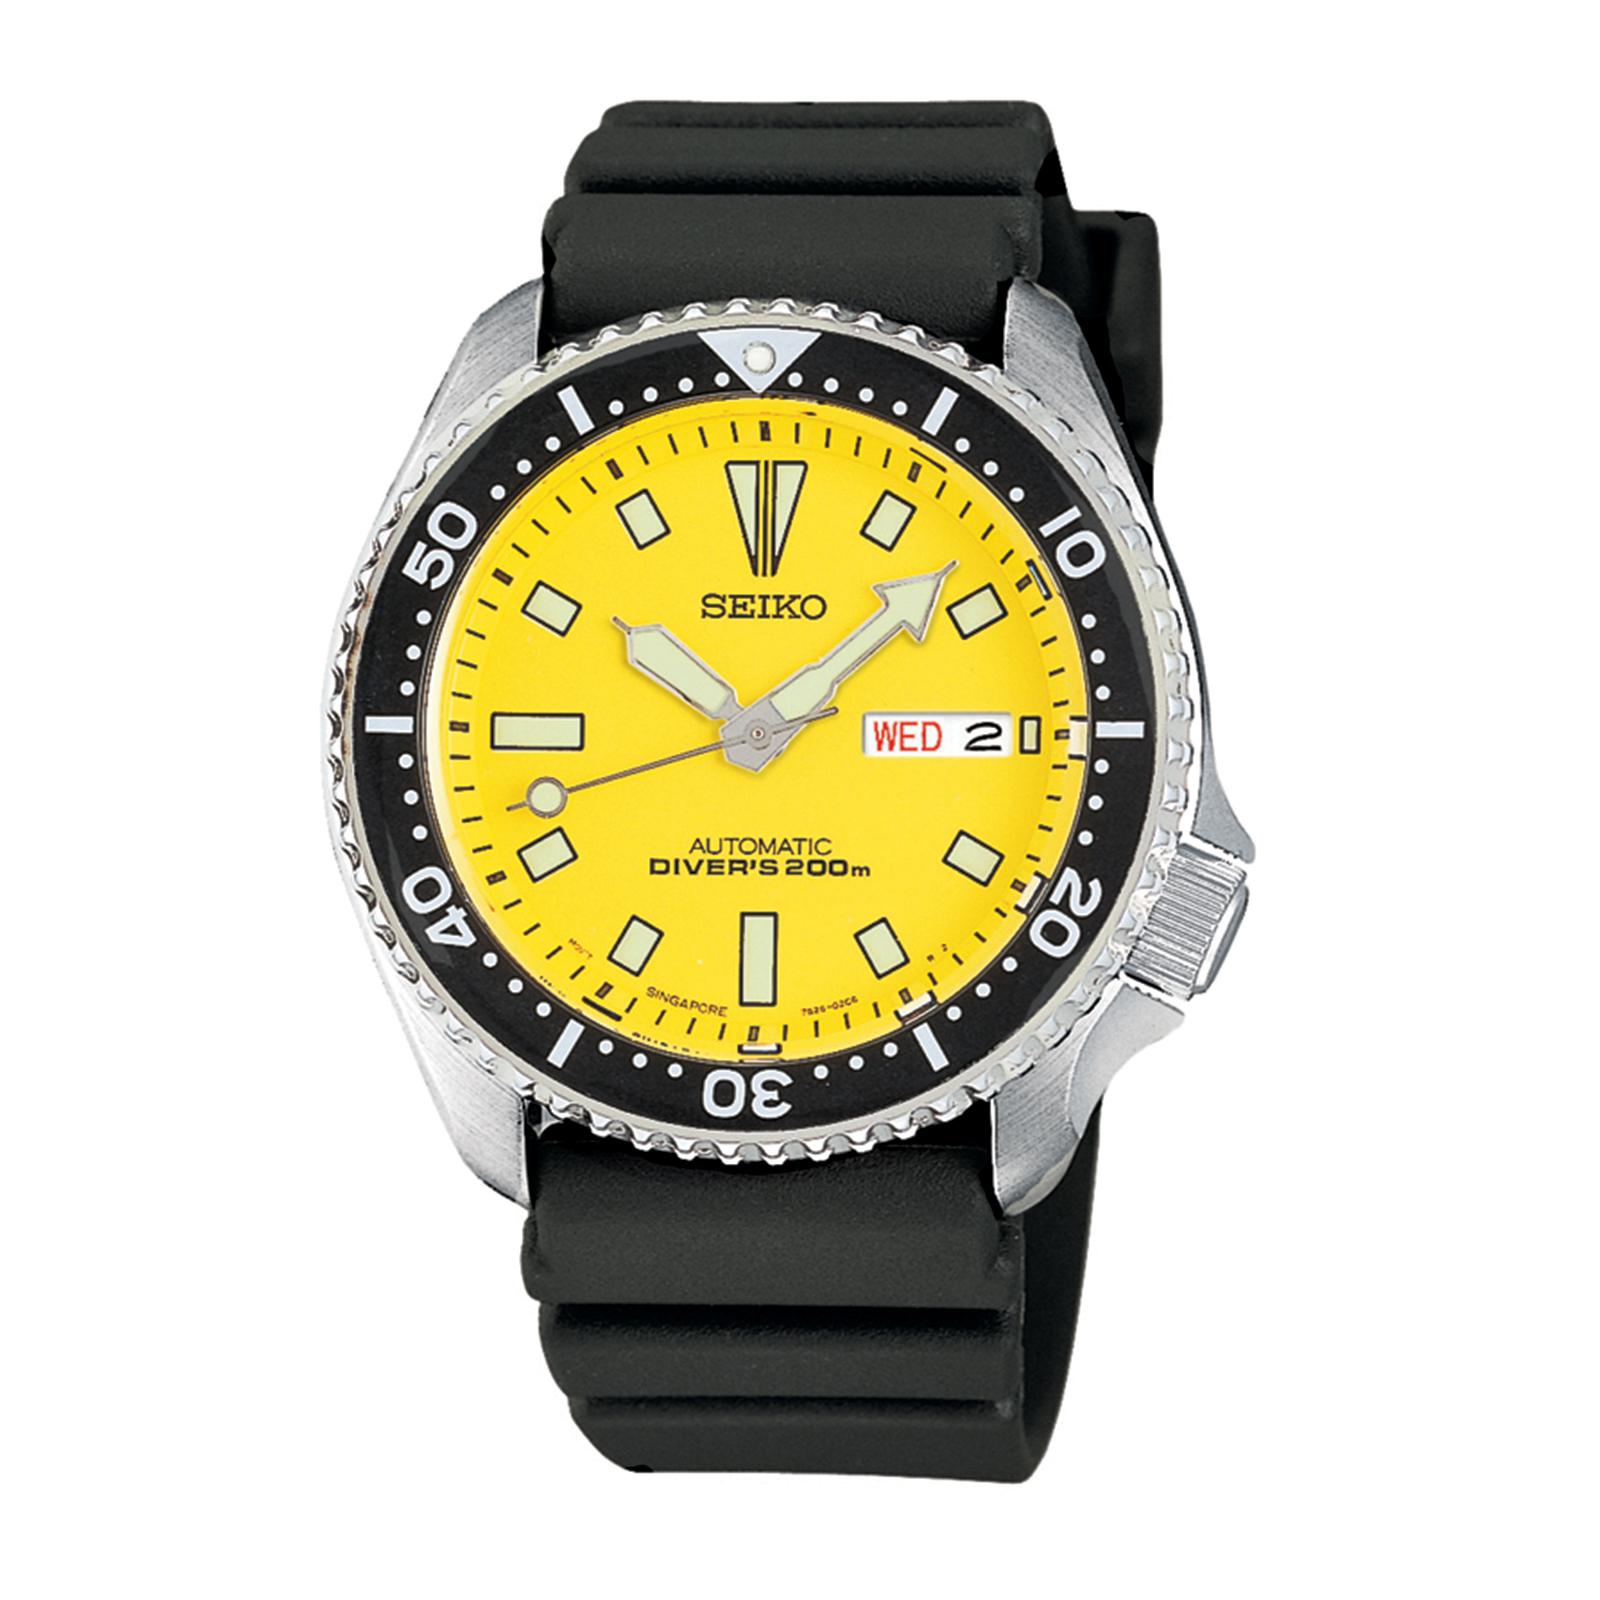 Seiko Mens Yellow Dial Automatic Divers Watch Skxa35